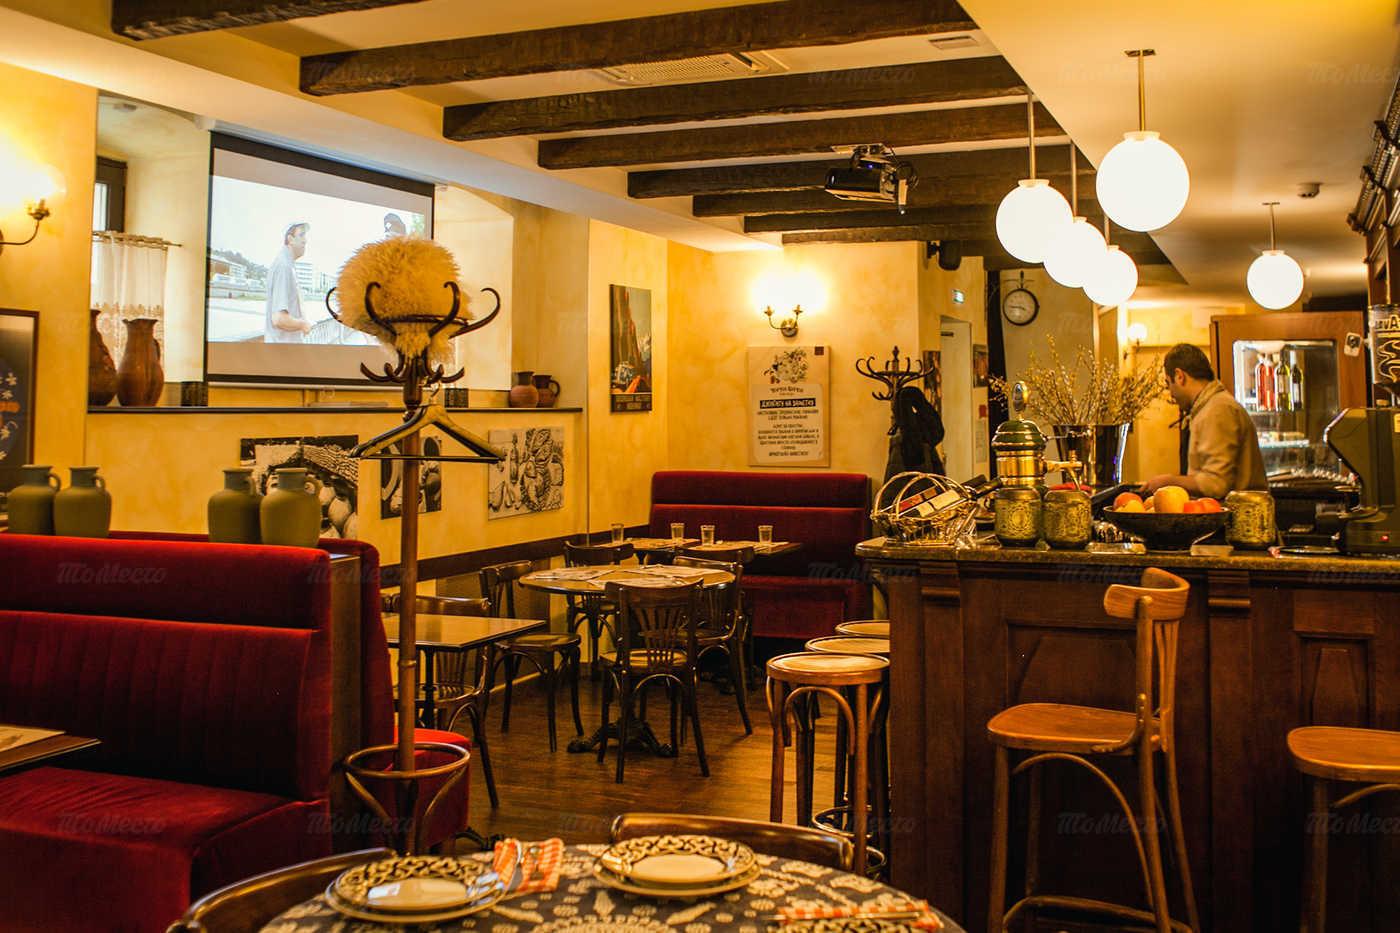 Ресторан Чичи-Бичи (Сhichi-Bichi) на Малой Морской фото 5